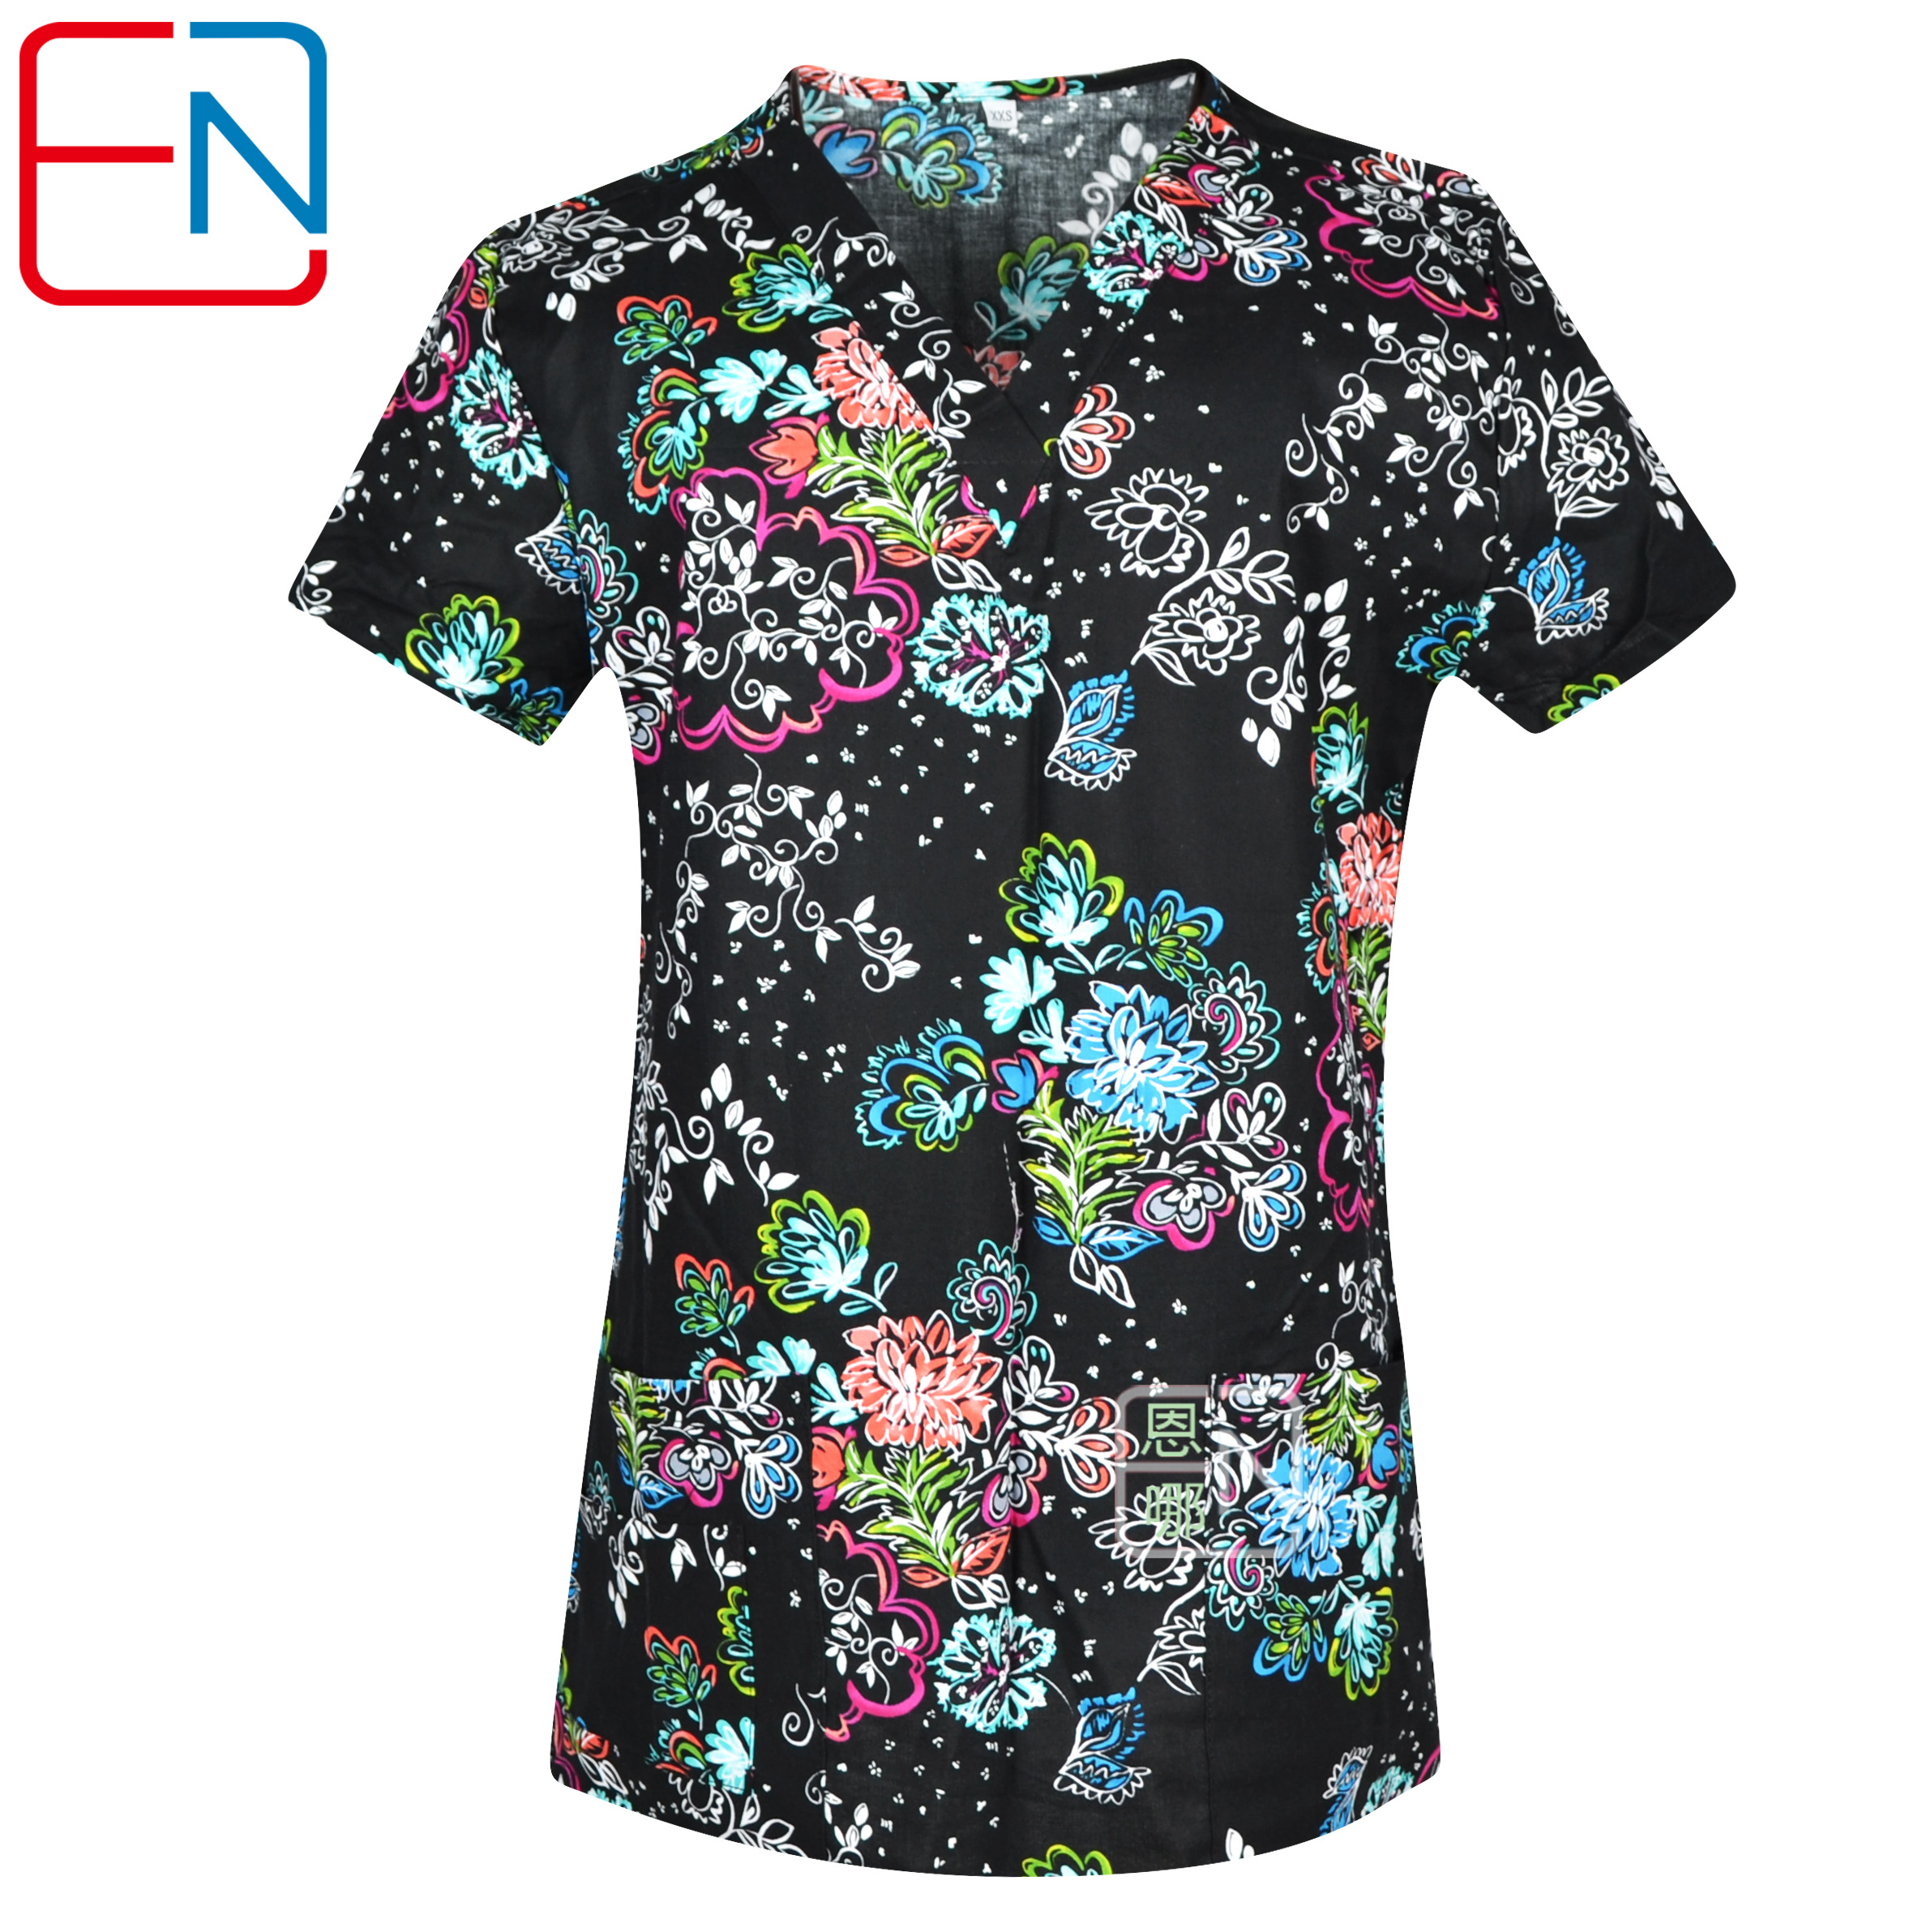 Big Sale Hennar Women Scrub Top With V-Neck 100% Cotton Print Surgical Medical Uniforms Hospital Nurse Scrub Tops For Women